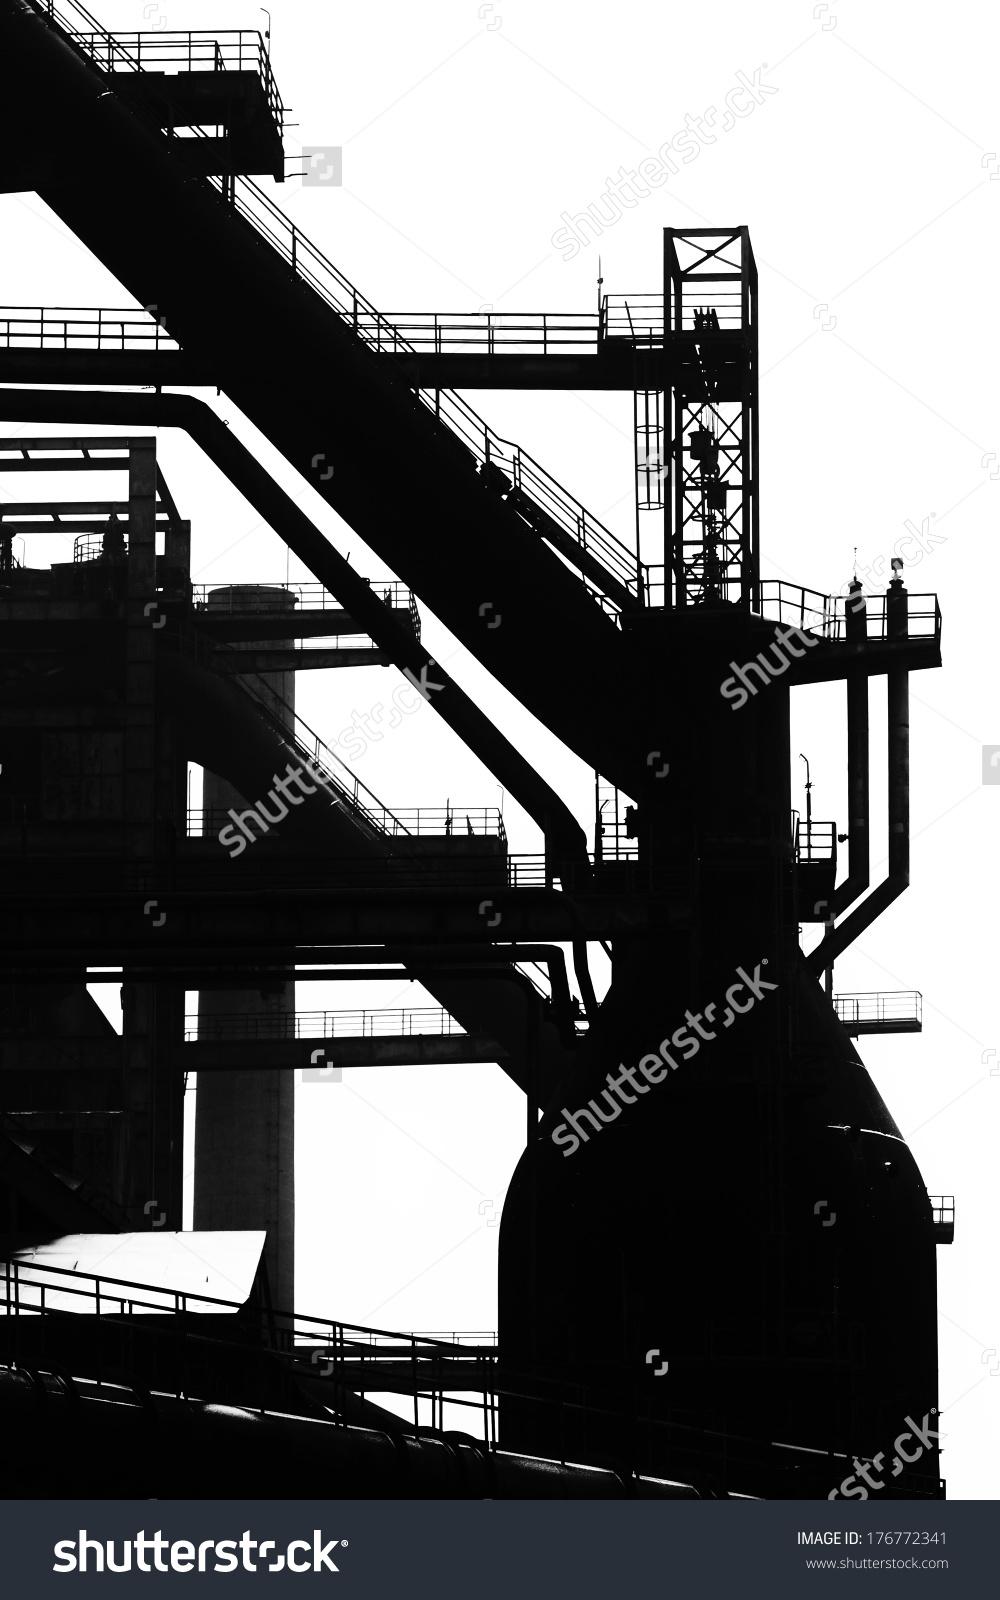 Blast Furnace Silhouette Heavy Steel Machinery Stock Illustration.